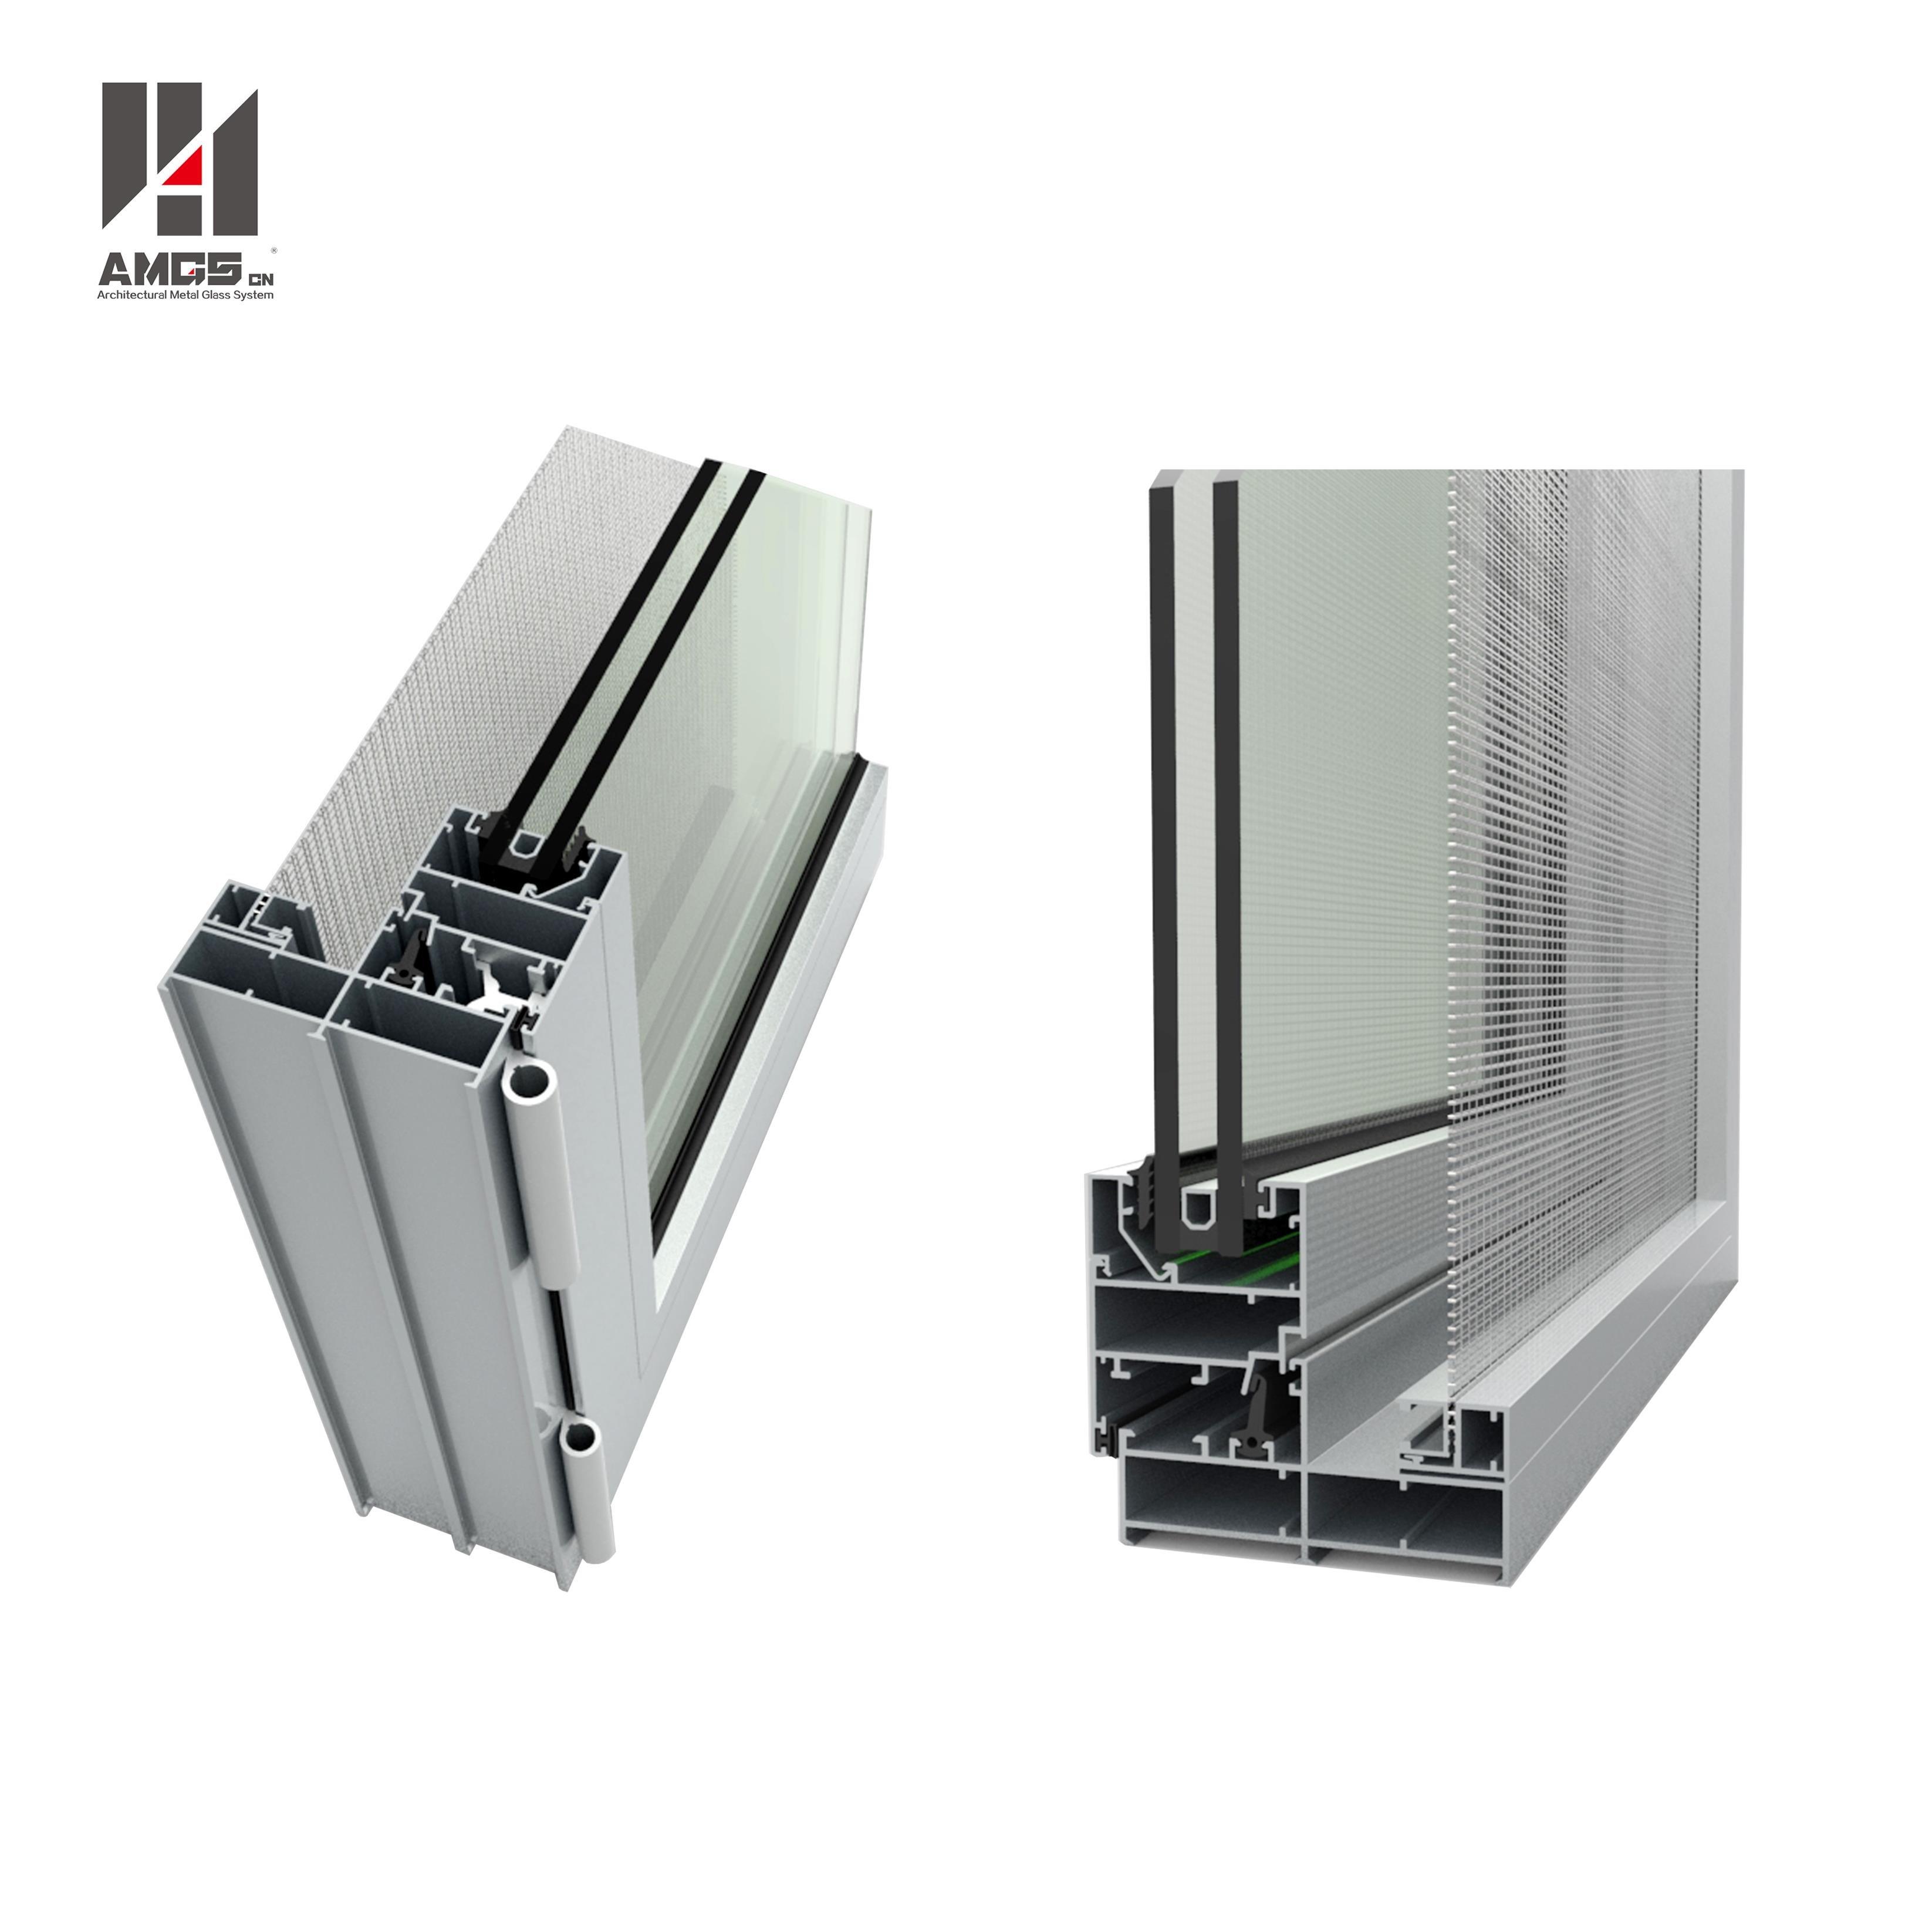 AMGS French Style Swing Aluminum Tilt&Turn Window With Double Glazing Glass Aluminum Tilt-turn Windows image1